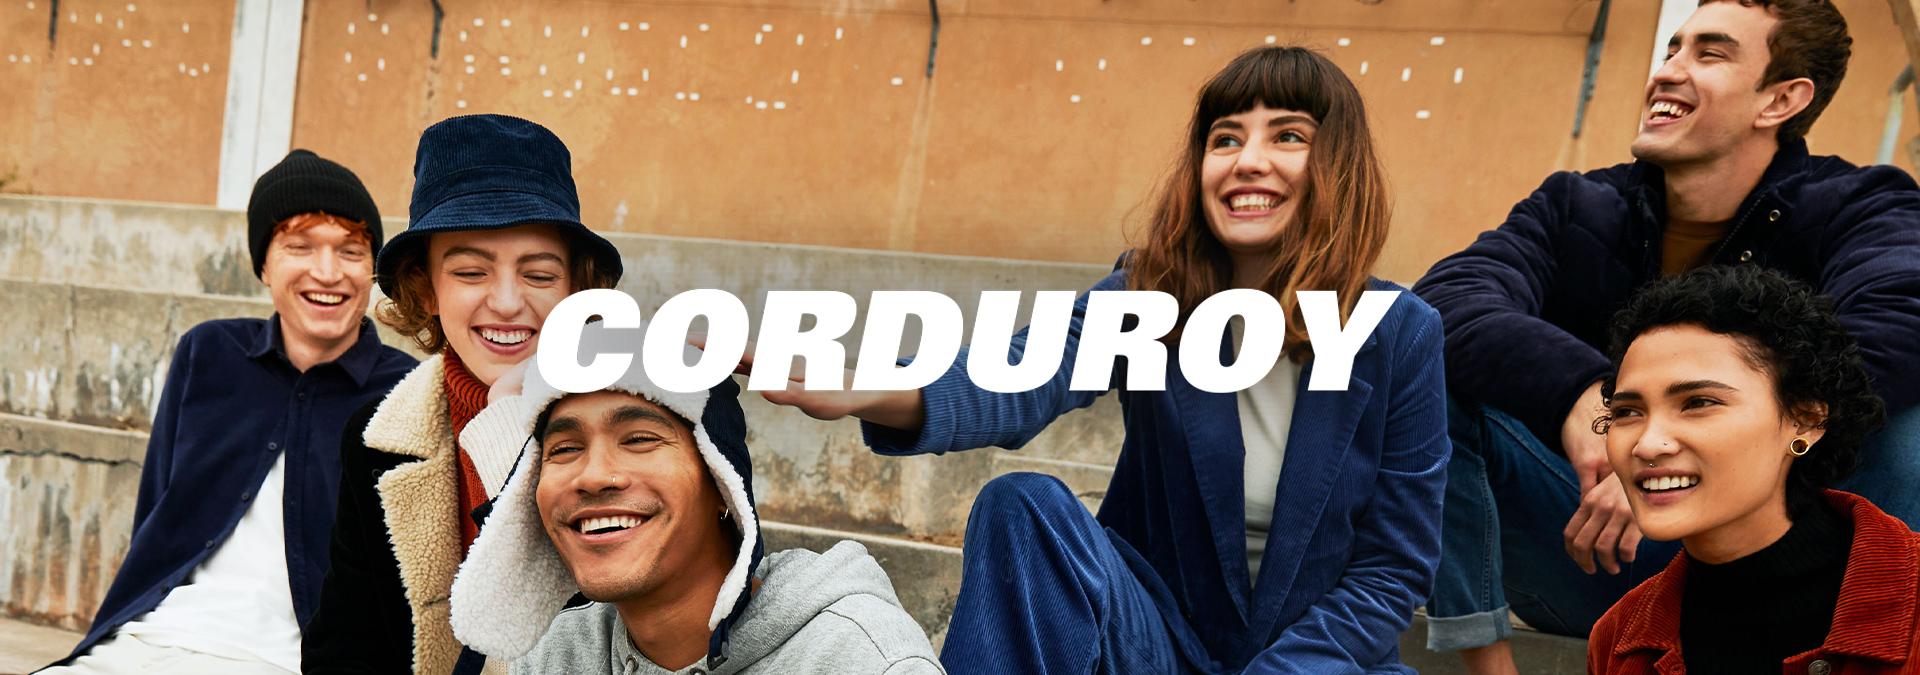 corduroy collection